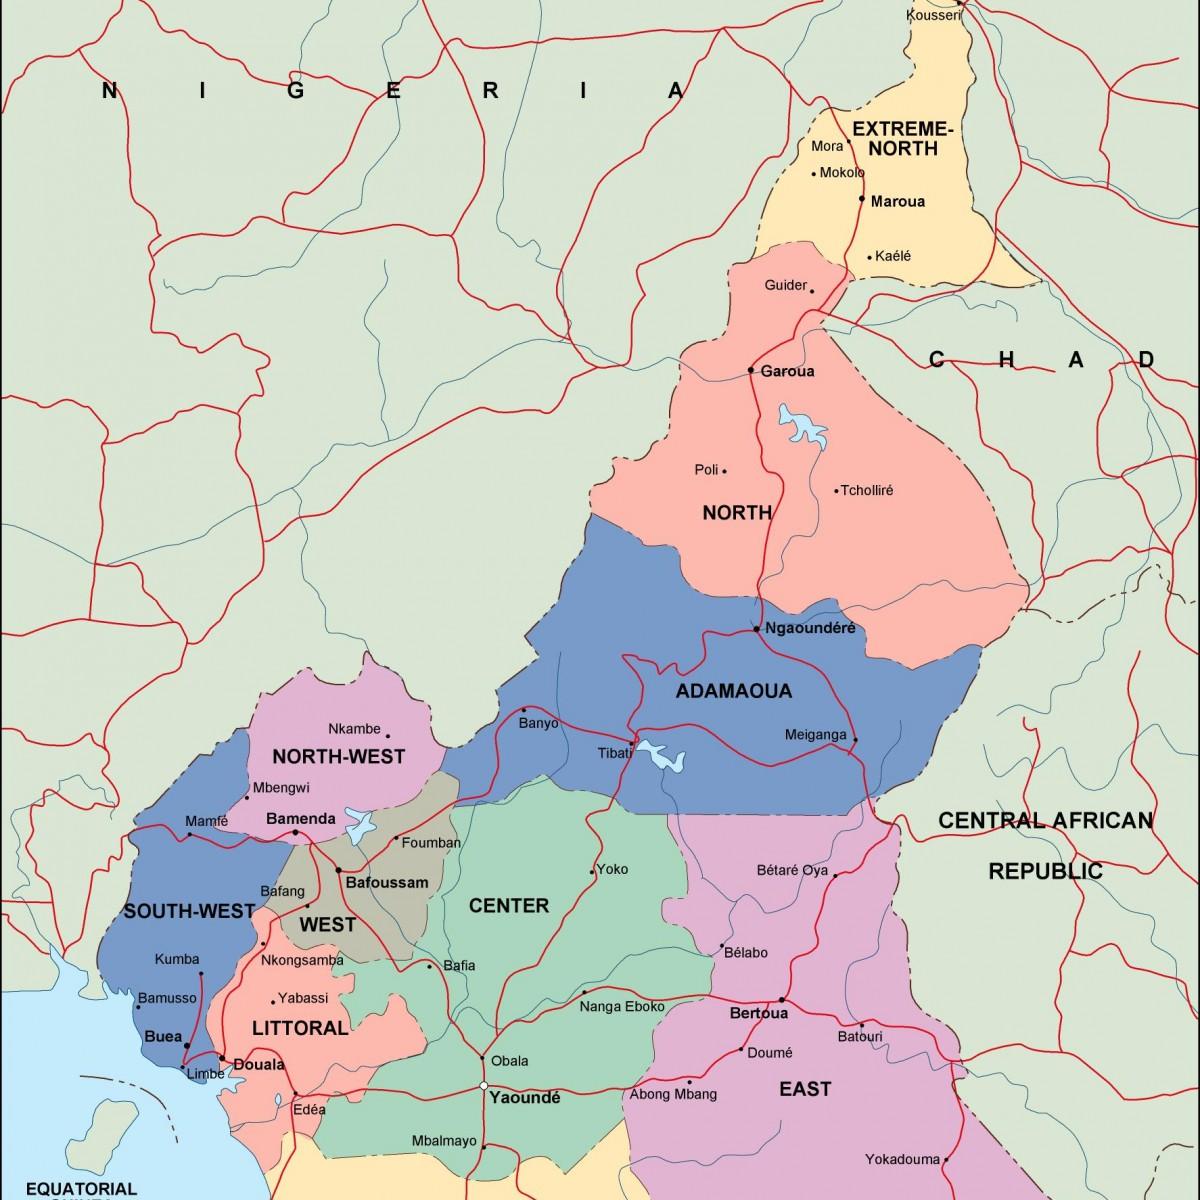 cameroon political map on côte d'ivoire map, estonia map, grenada map, monaco map, gambia map, saudi arabia map, rwanda map, madagascar map, ghana map, egypt map, mali map, sudan map, namibia map, croatia map, tunisia map, congo map, algeria map, thailand map, kenya map, angola map, liberia map, cape verde map, morocco map, gabon map, uganda map, africa map, libya map, nigeria map, senegal map, malawi map, ecuador map, comoros map, niger map, ethiopia map, mozambique map, zimbabwe map,